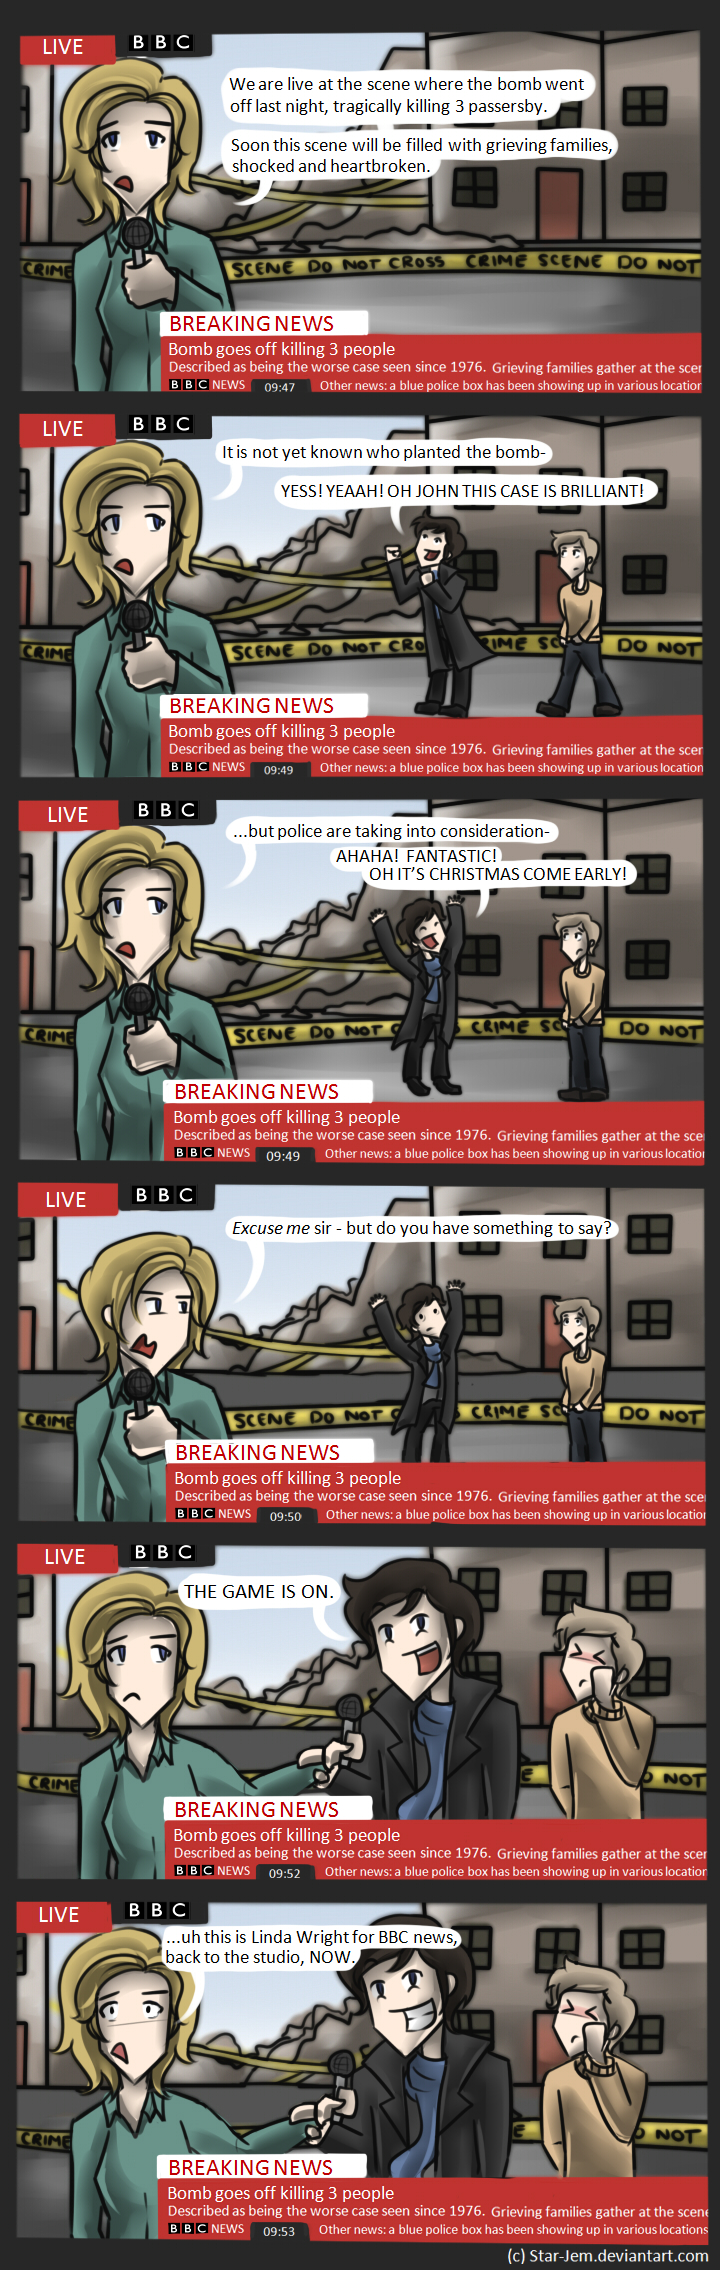 Sherlock can't resist a crime scene by Star-Jem